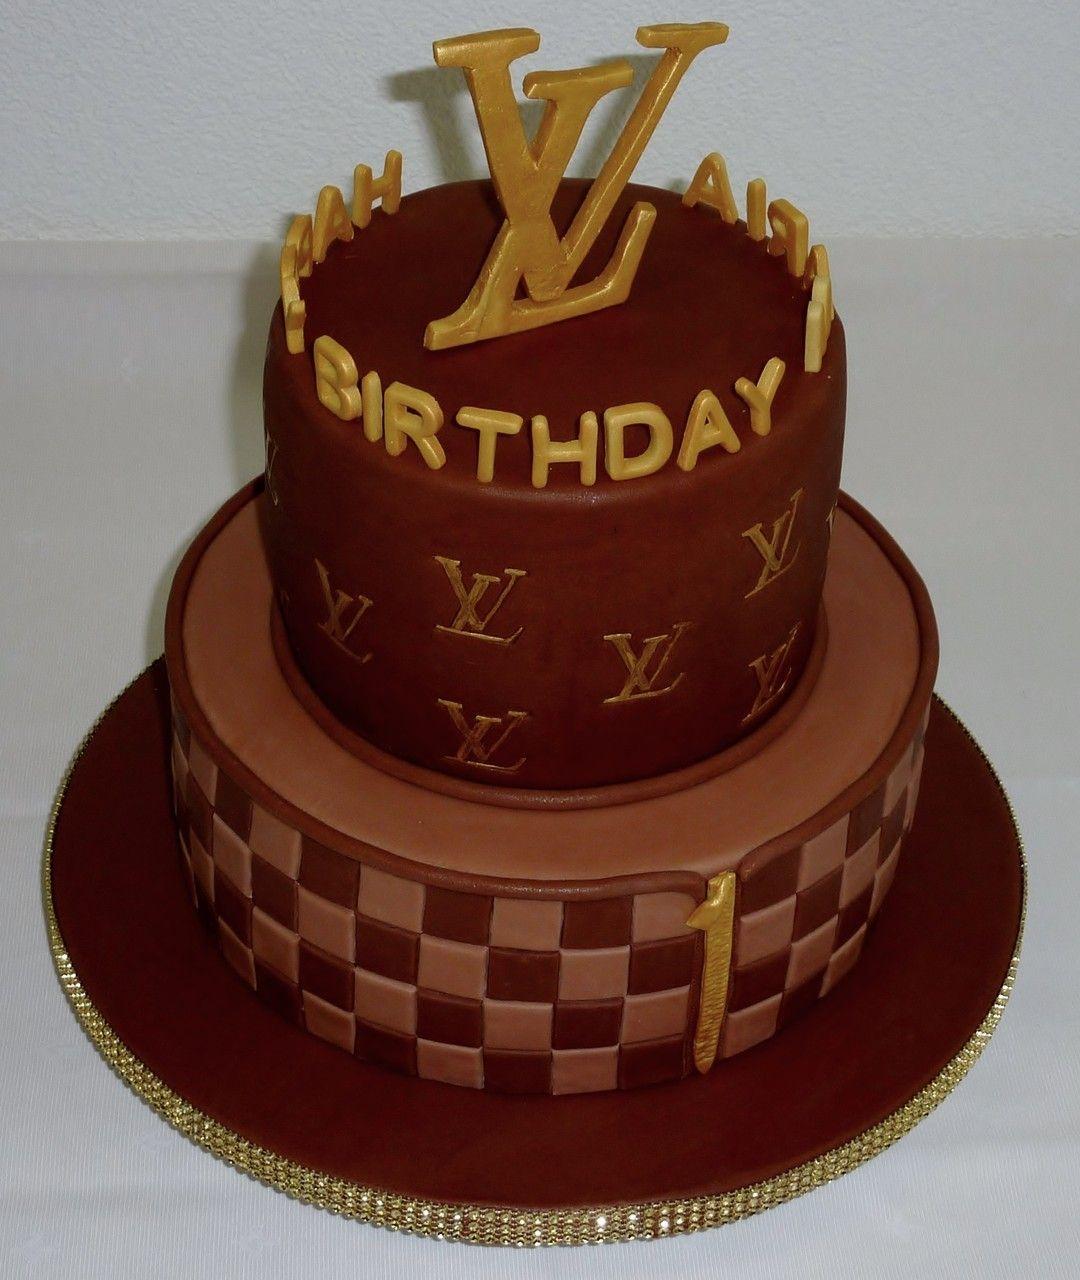 Louis Vuitton Cake 12th Birthday Cakes For Women Mum